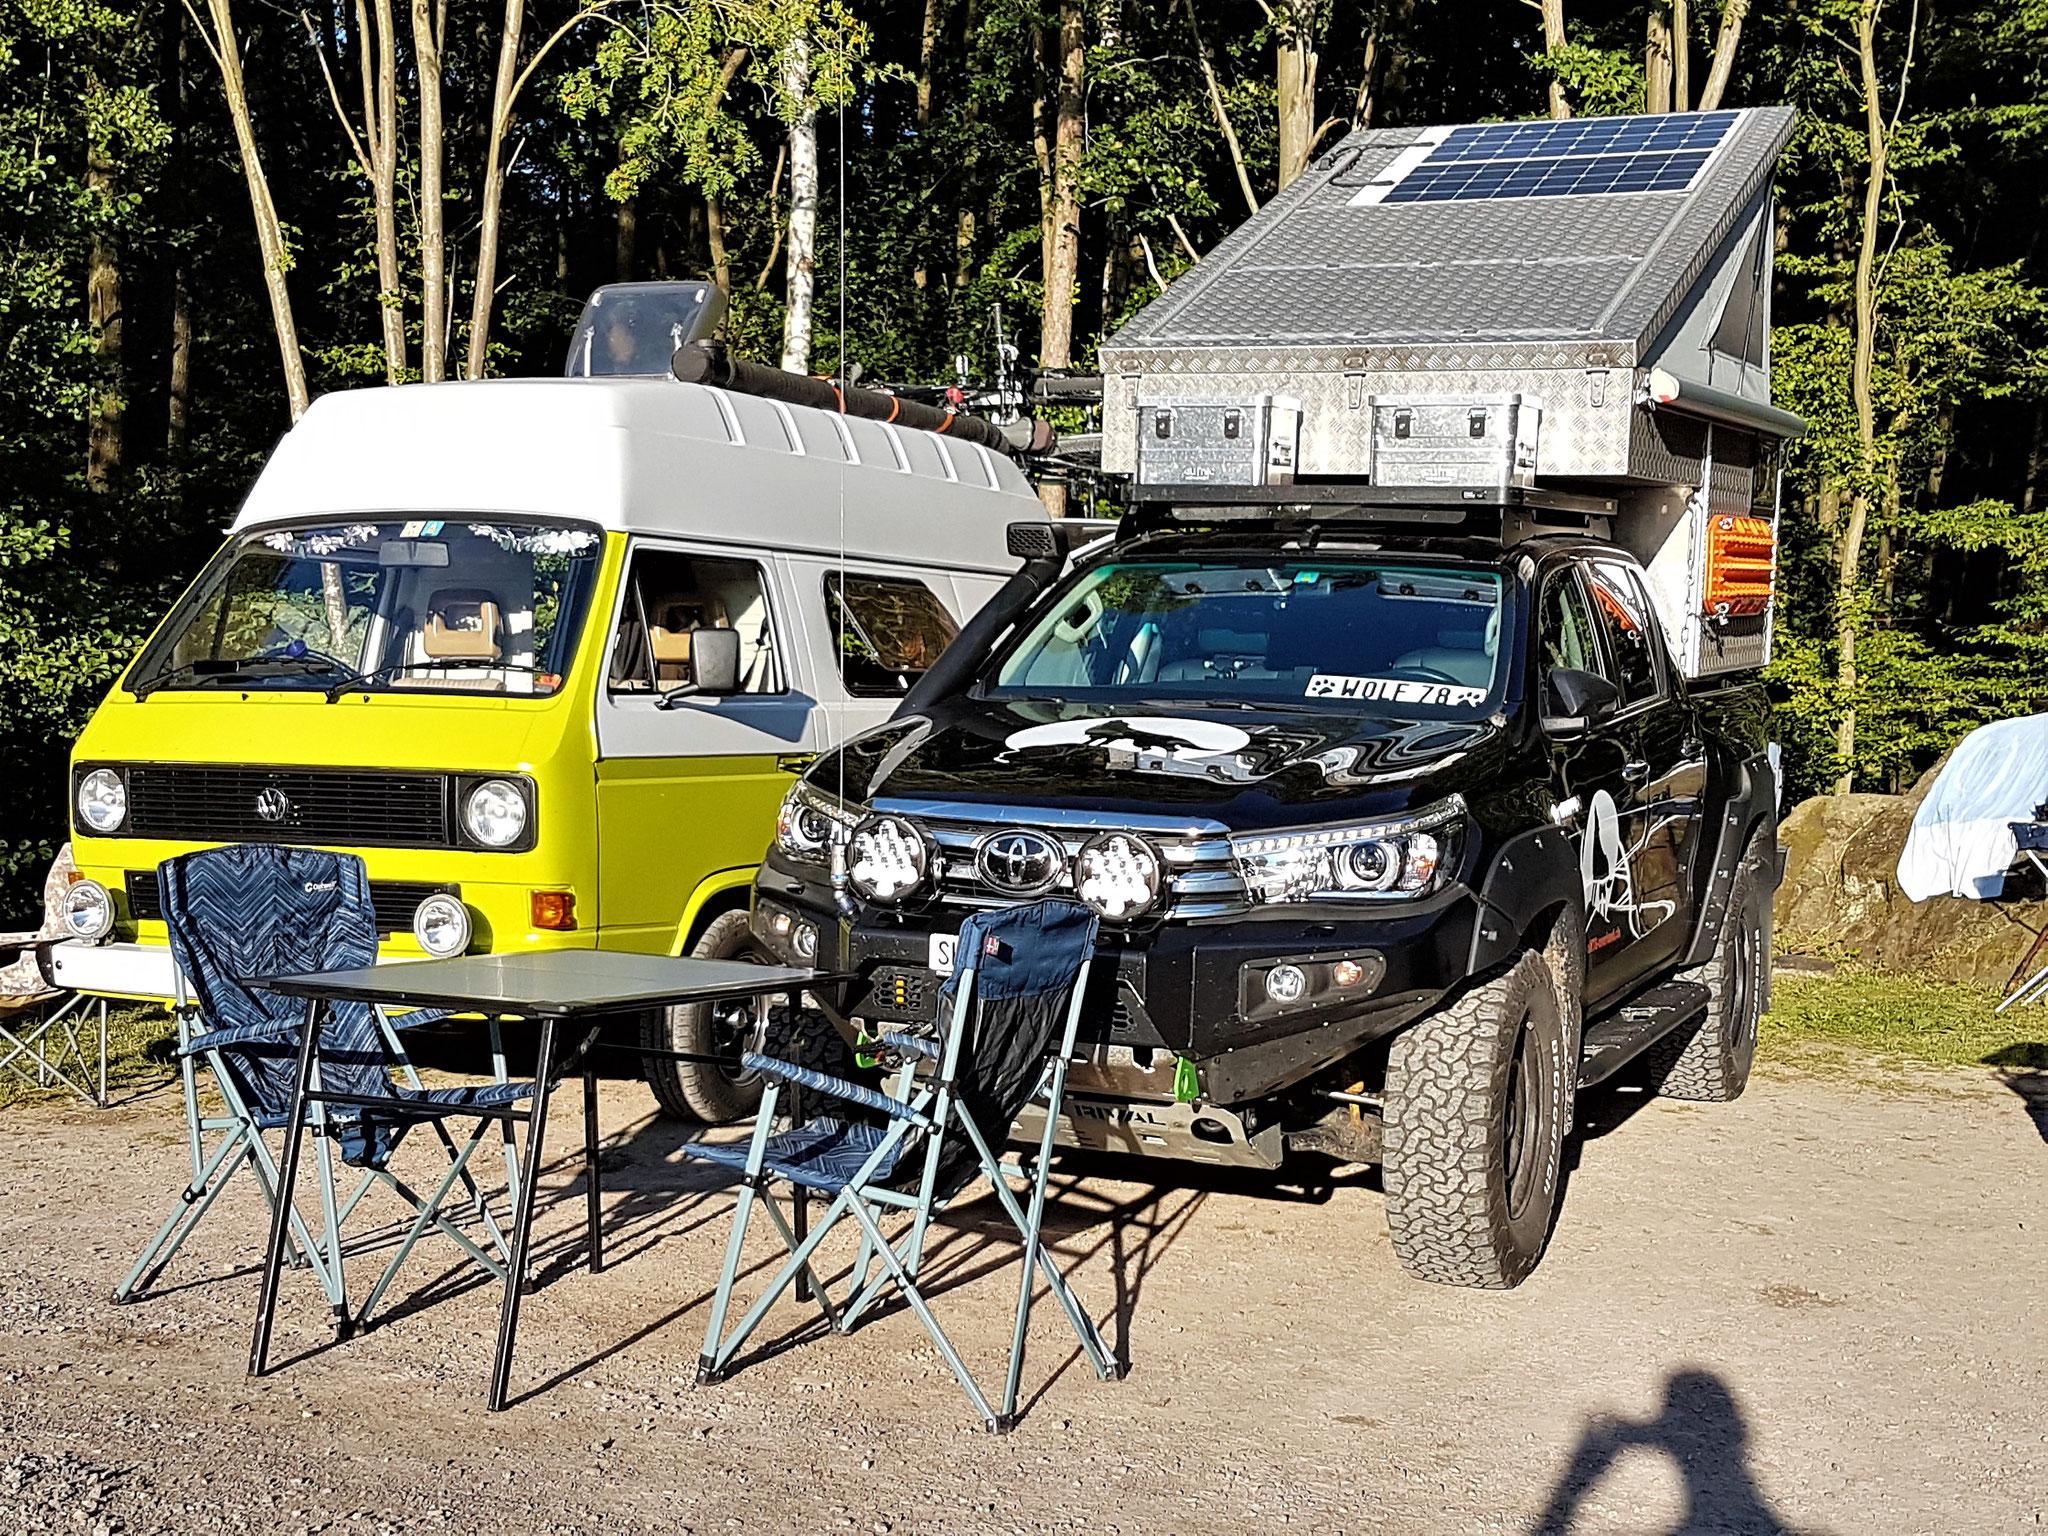 Schweden Landscape Toyota Hilux Pickup-camper Arctic Trucks Skandinavien #ProjektBlackwolf wolf78 driive your own way offroad overland Travel Camping 4x4 AFN4x4 frontrunneroutfitters #BornToRoam Rival4x4  overlandbound wolf78-overland.ch